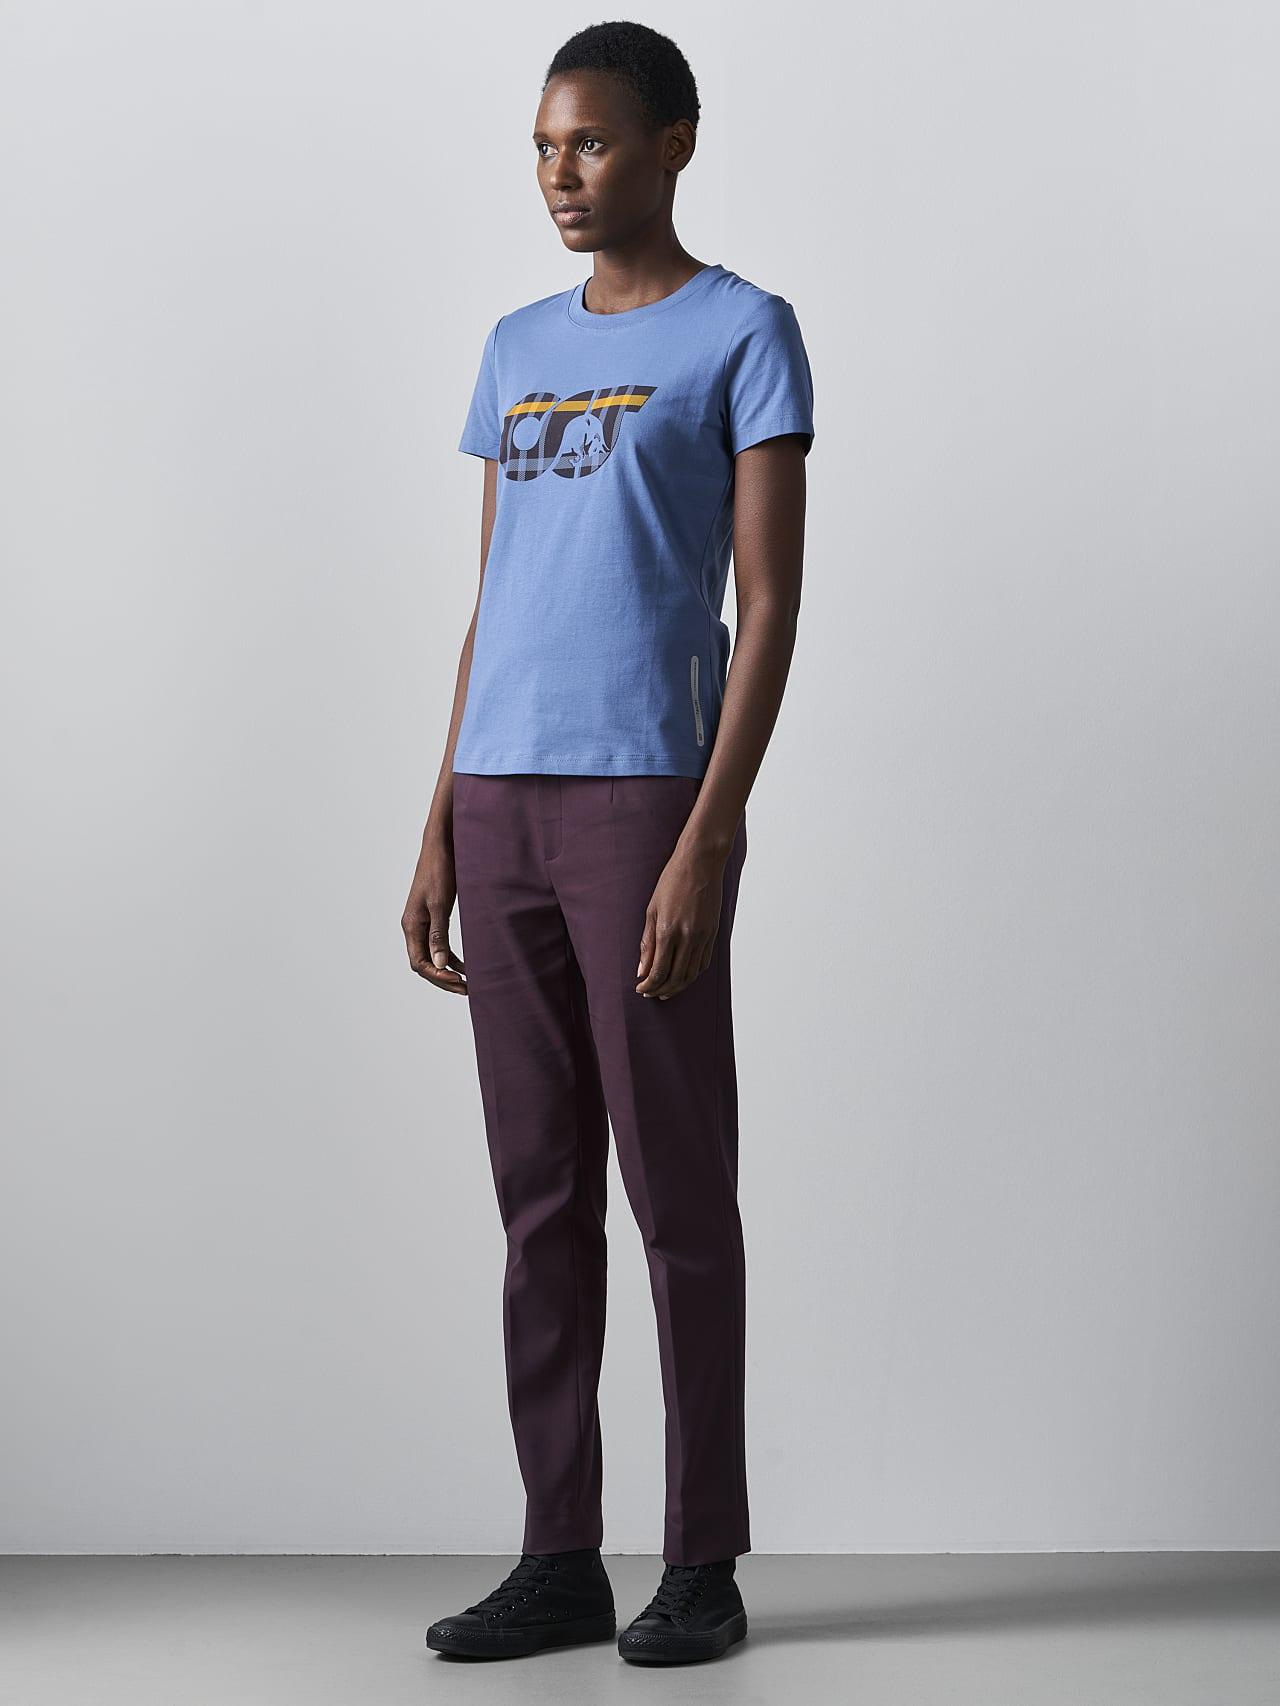 JANPA V1.Y5.02 Logo Print T-Shirt light blue Front Alpha Tauri